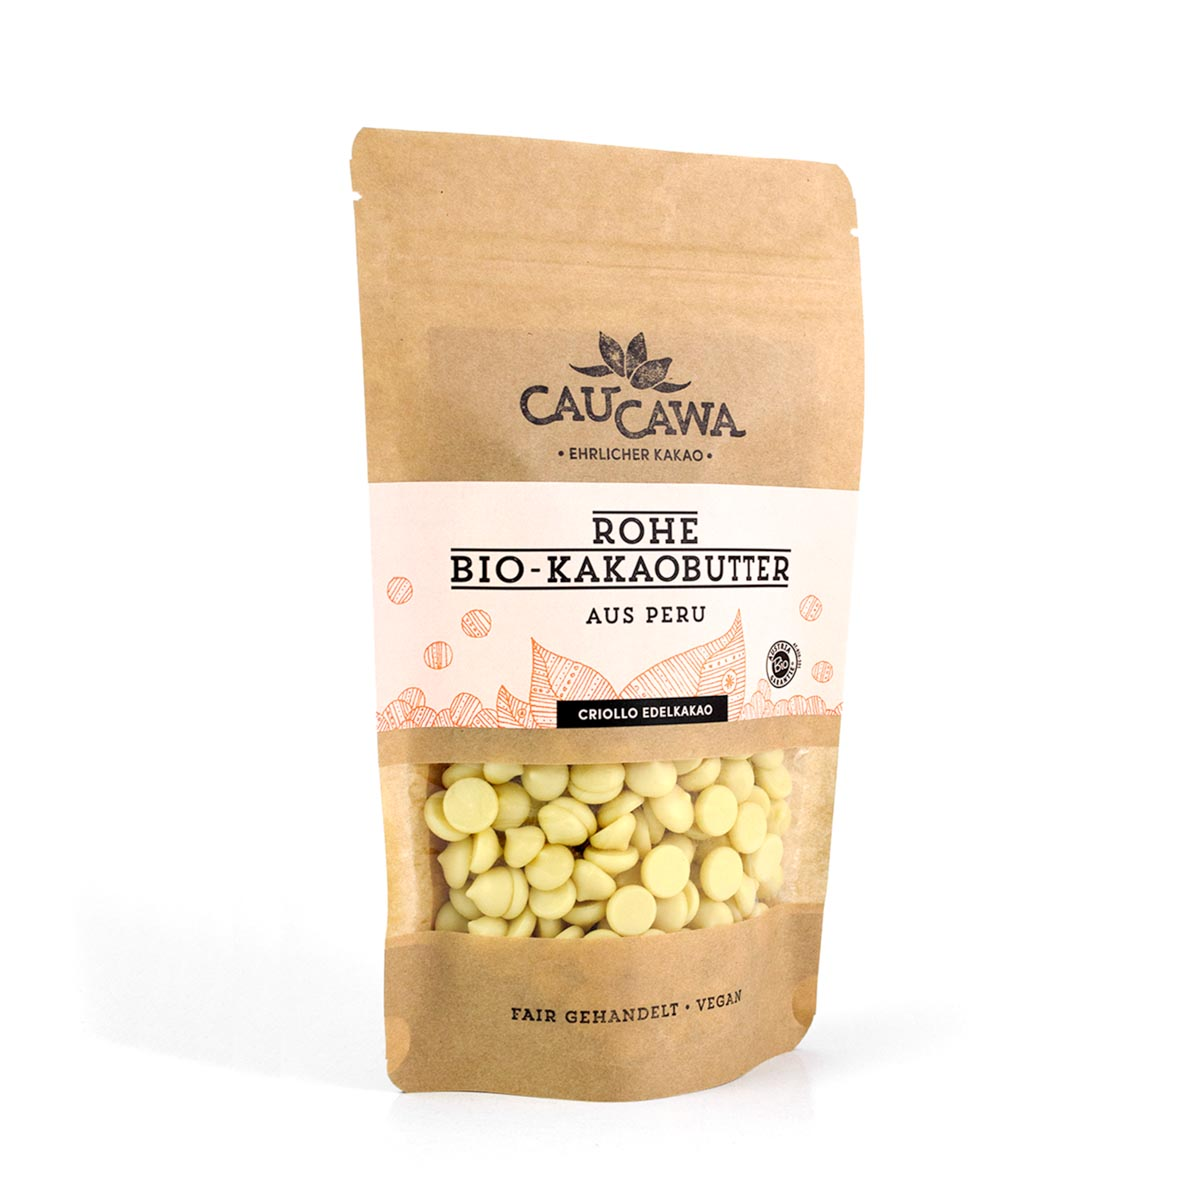 BIO Kakaobutter aus Peru – roh – 150g